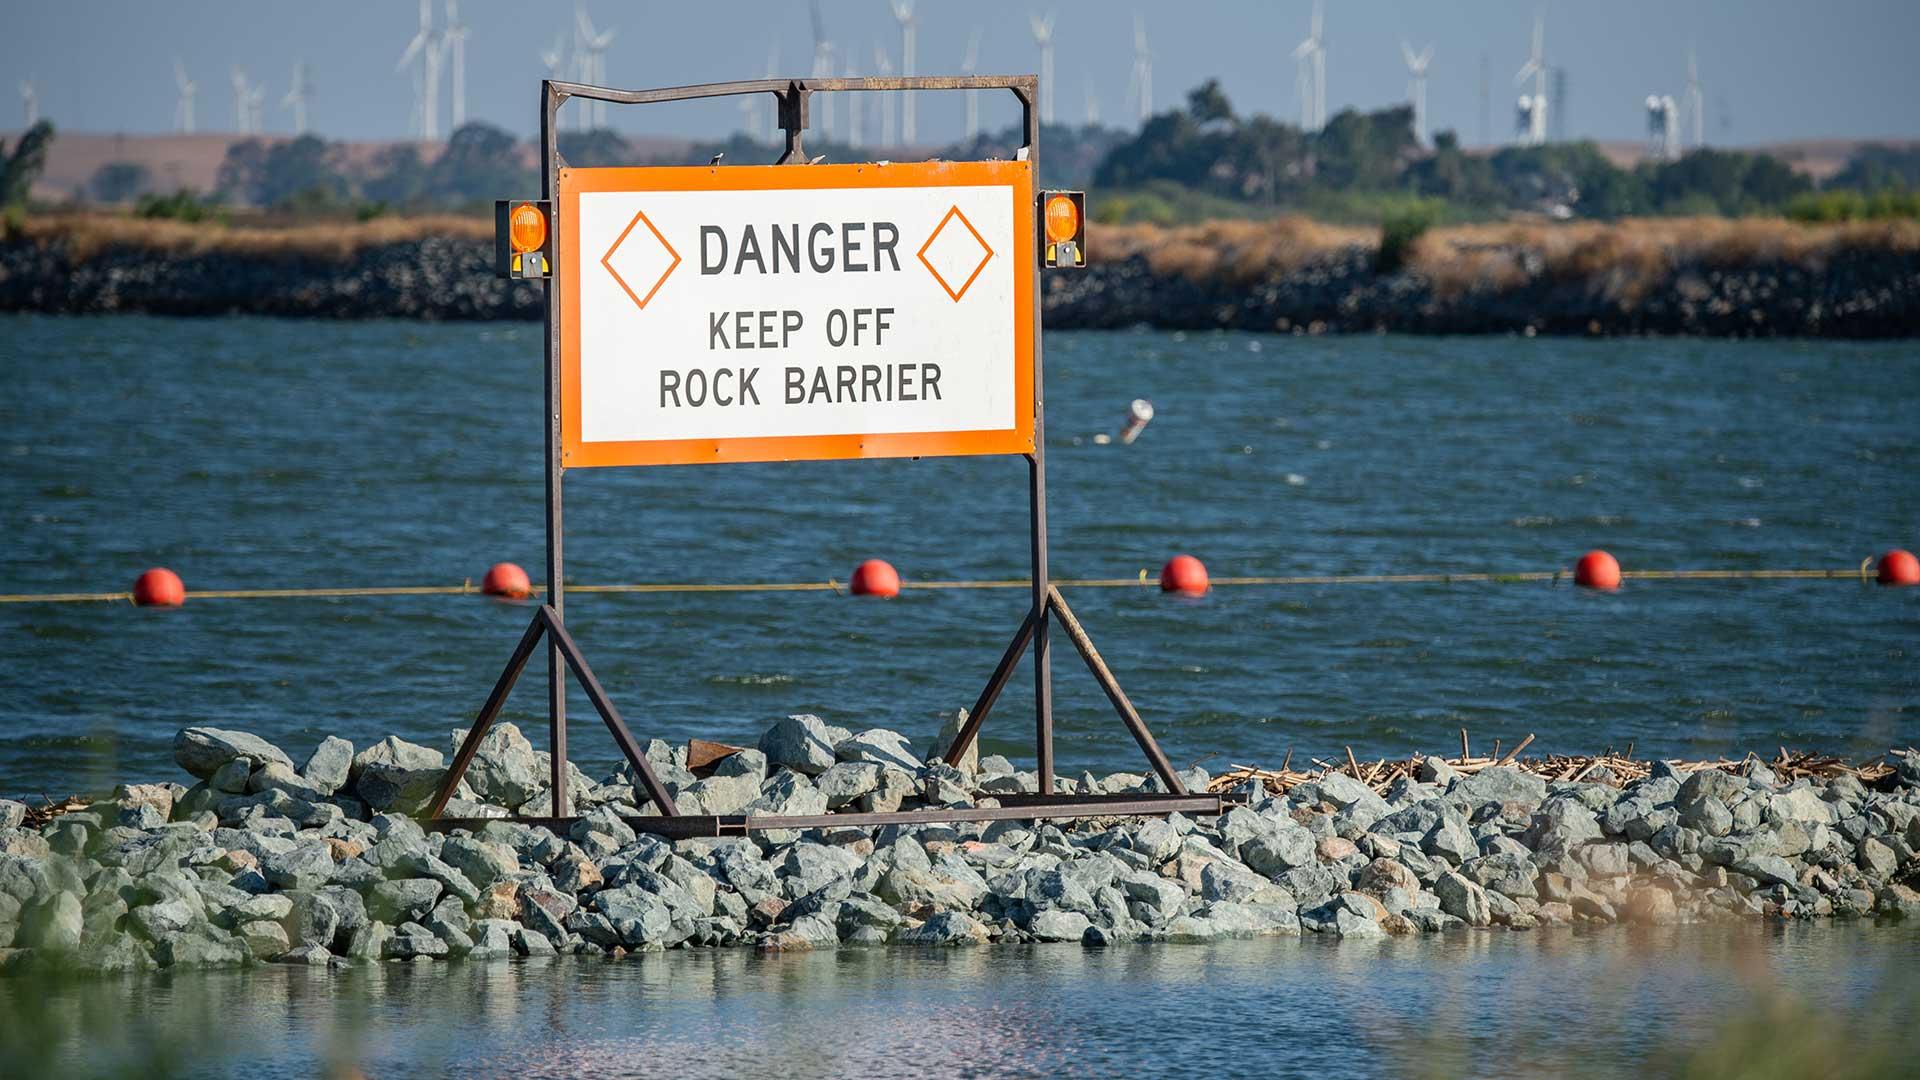 A rock barrier spans a river